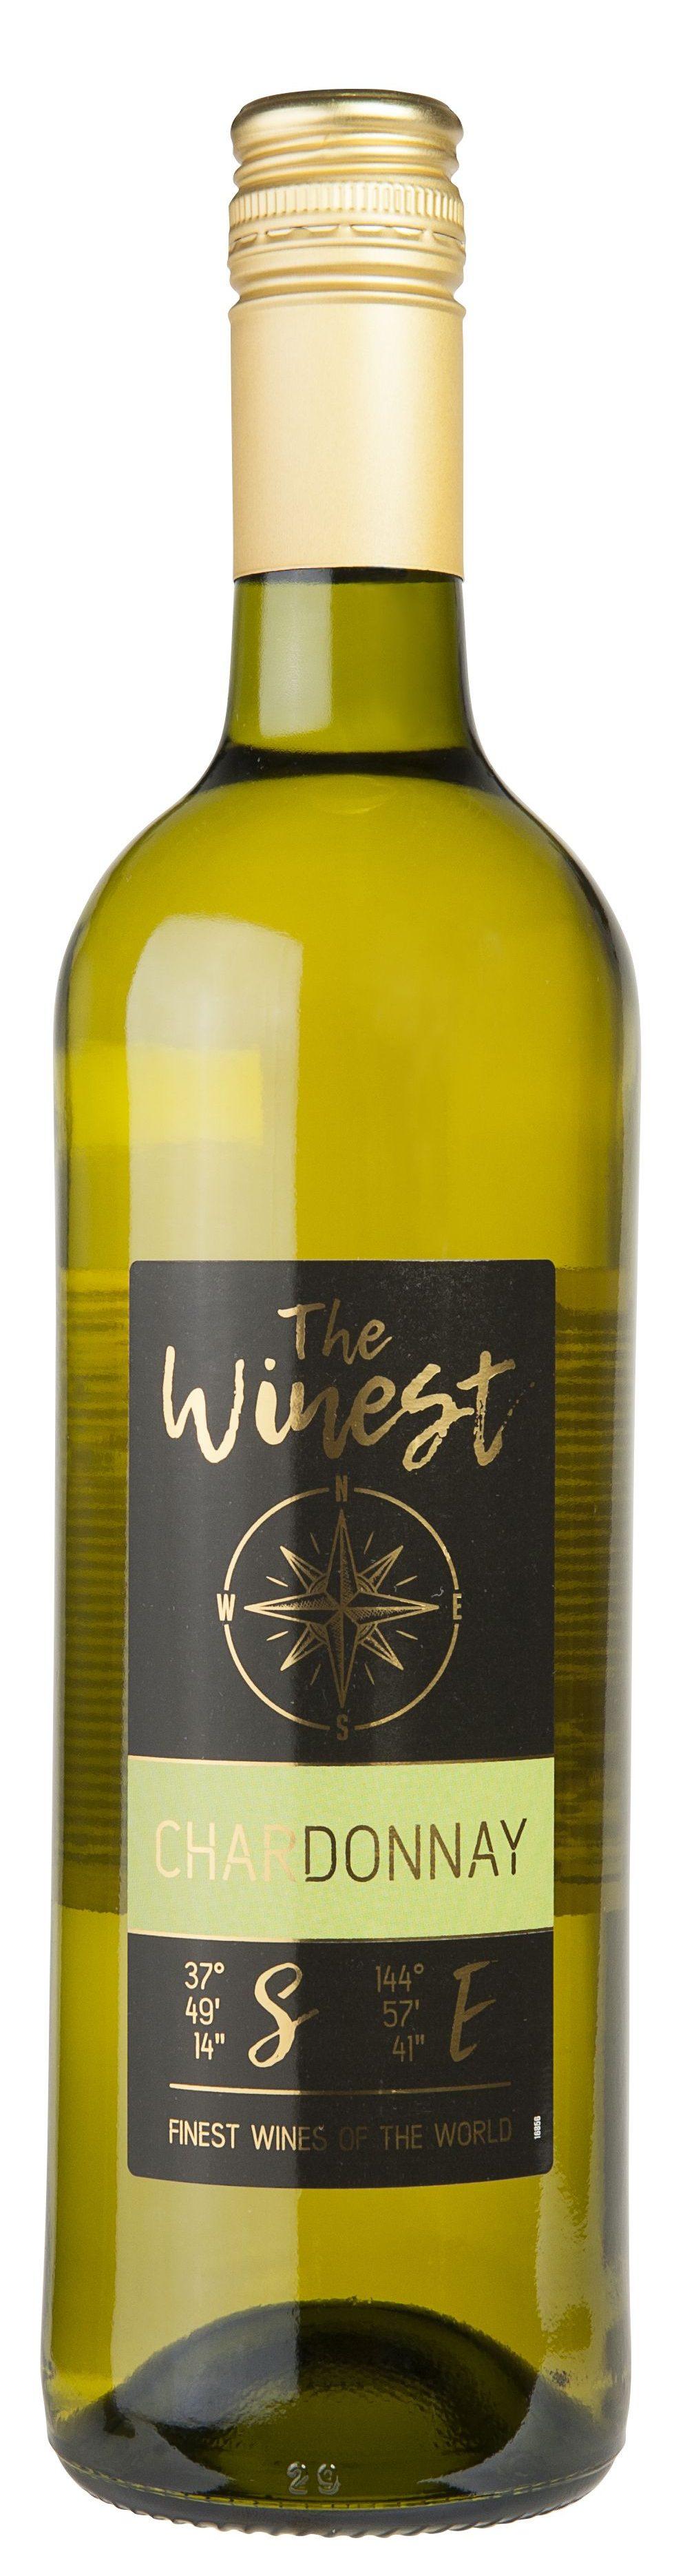 The Winest, Chardonnay